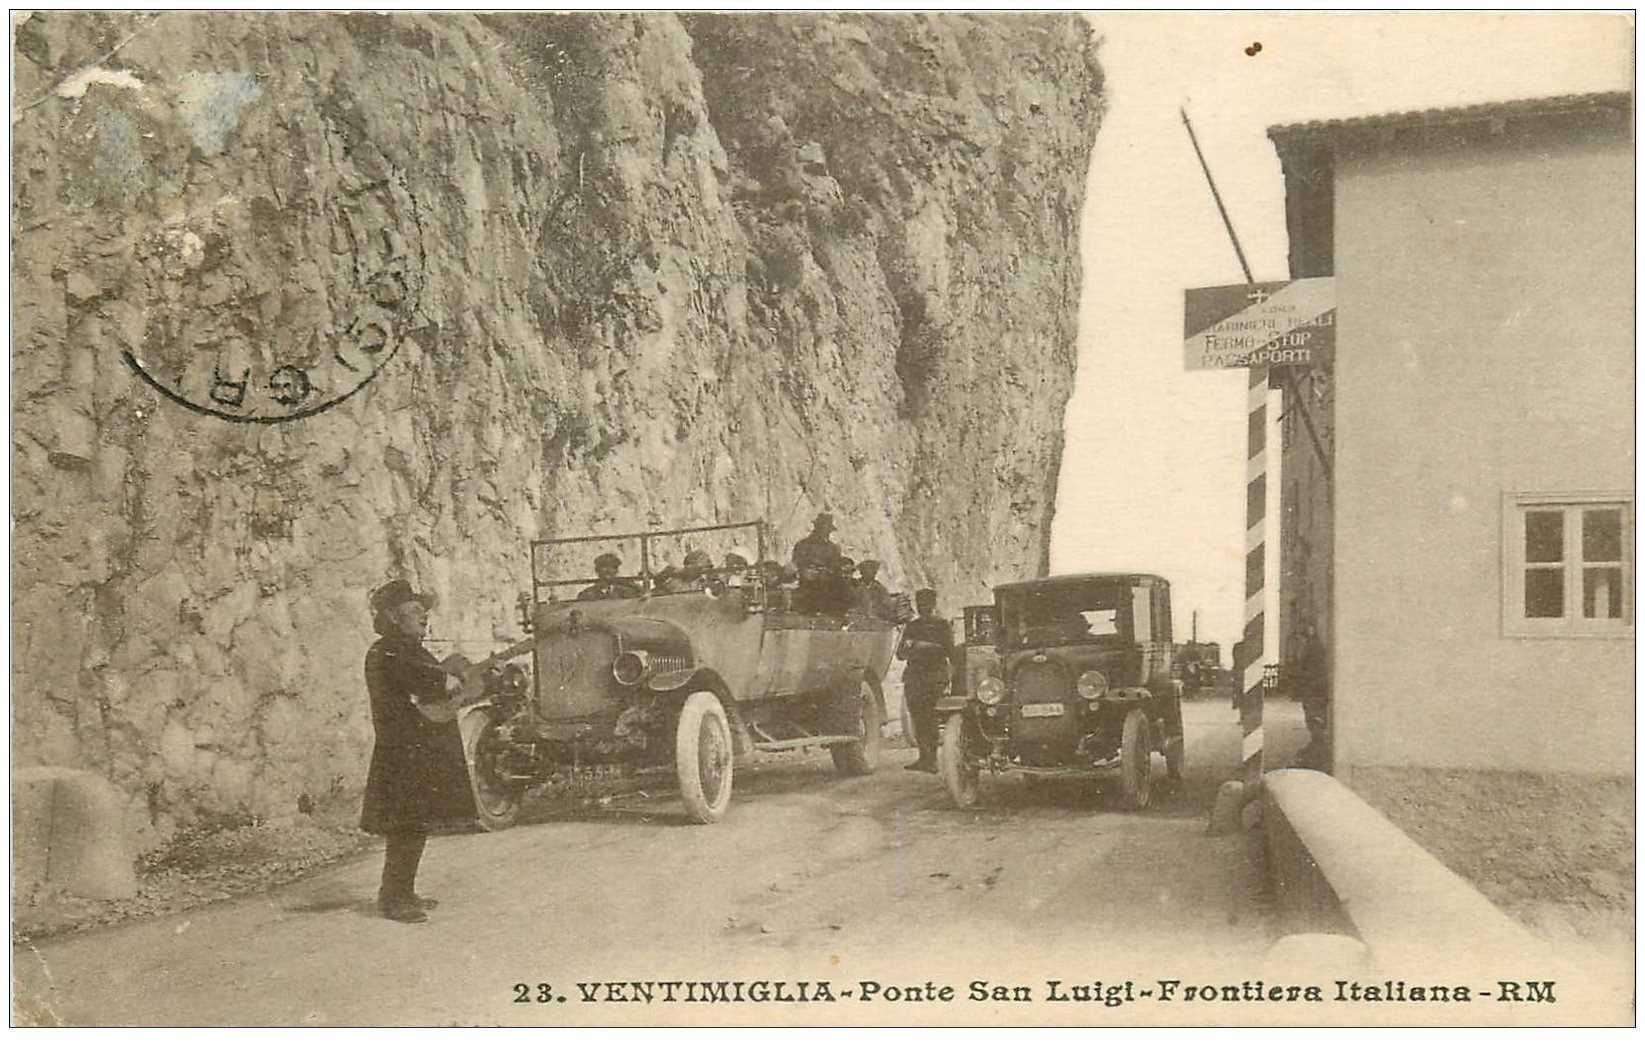 carte postale ancienne Italia Italie. VENTIMIGLIA. Ponte San Luigi Frontièra Italiana 1929. Timbre absent